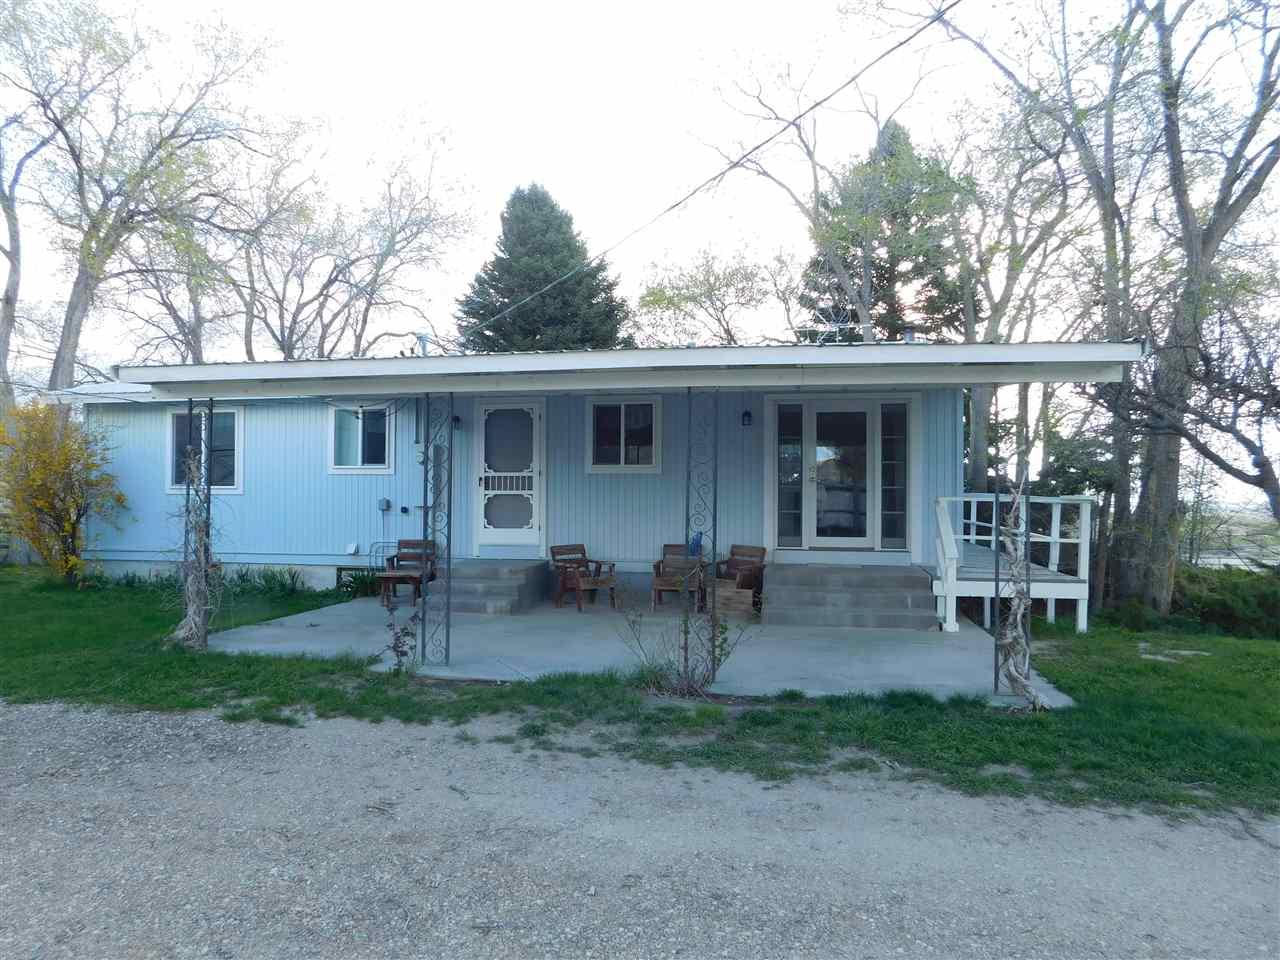 Single Family Home for Sale at 16990 Shortcut Rd Oreana, Idaho 83650